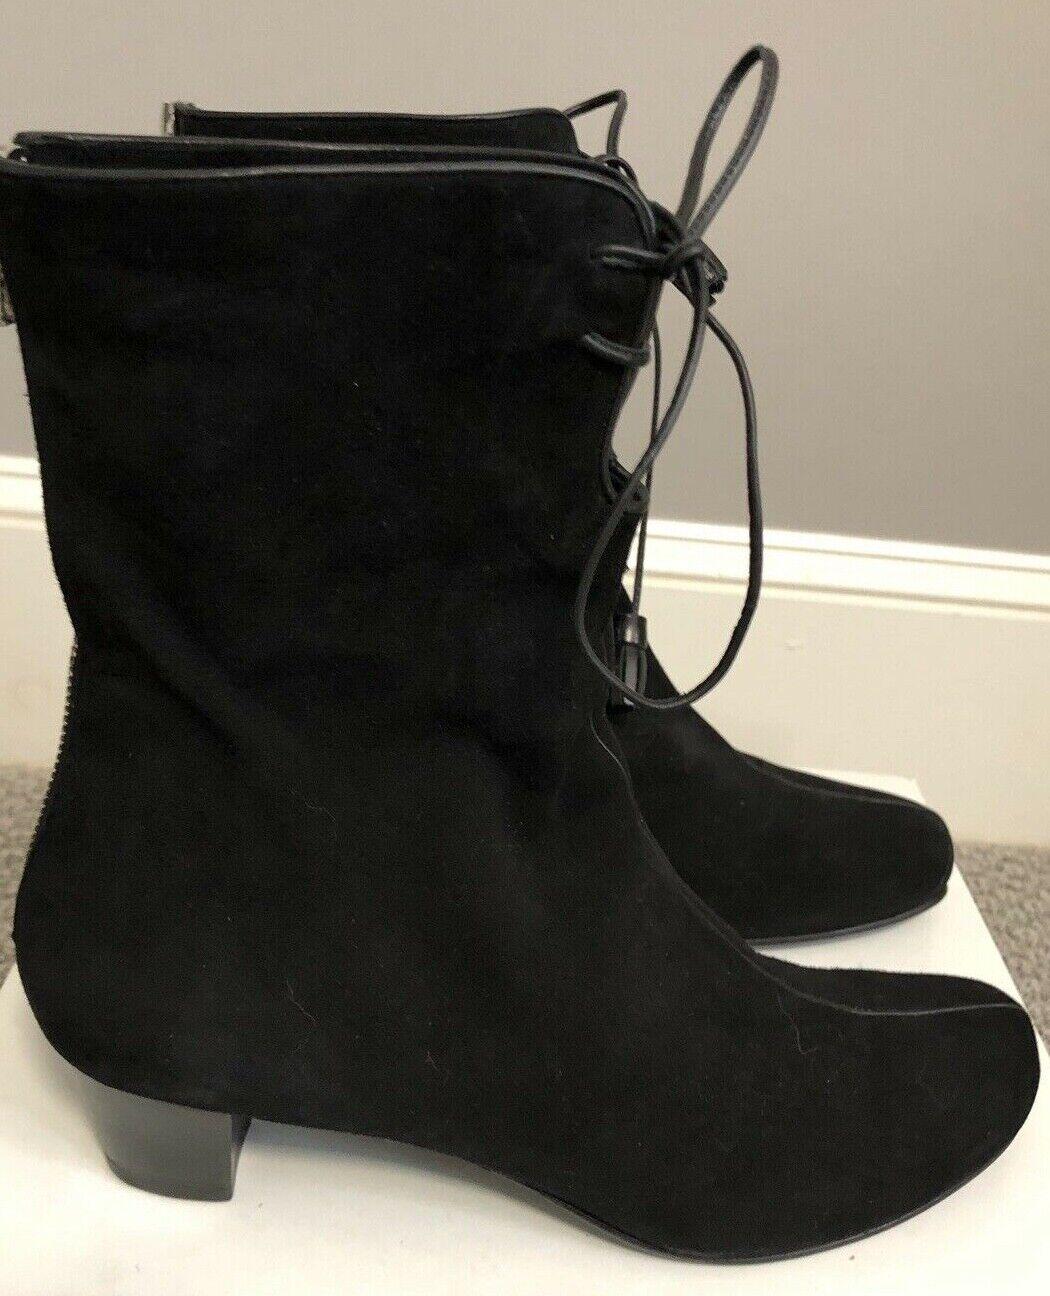 ultimi stili nero Suede Tassel stivali stivali stivali by Stefi Talman sz 38.5  US 8 made in   offerta speciale